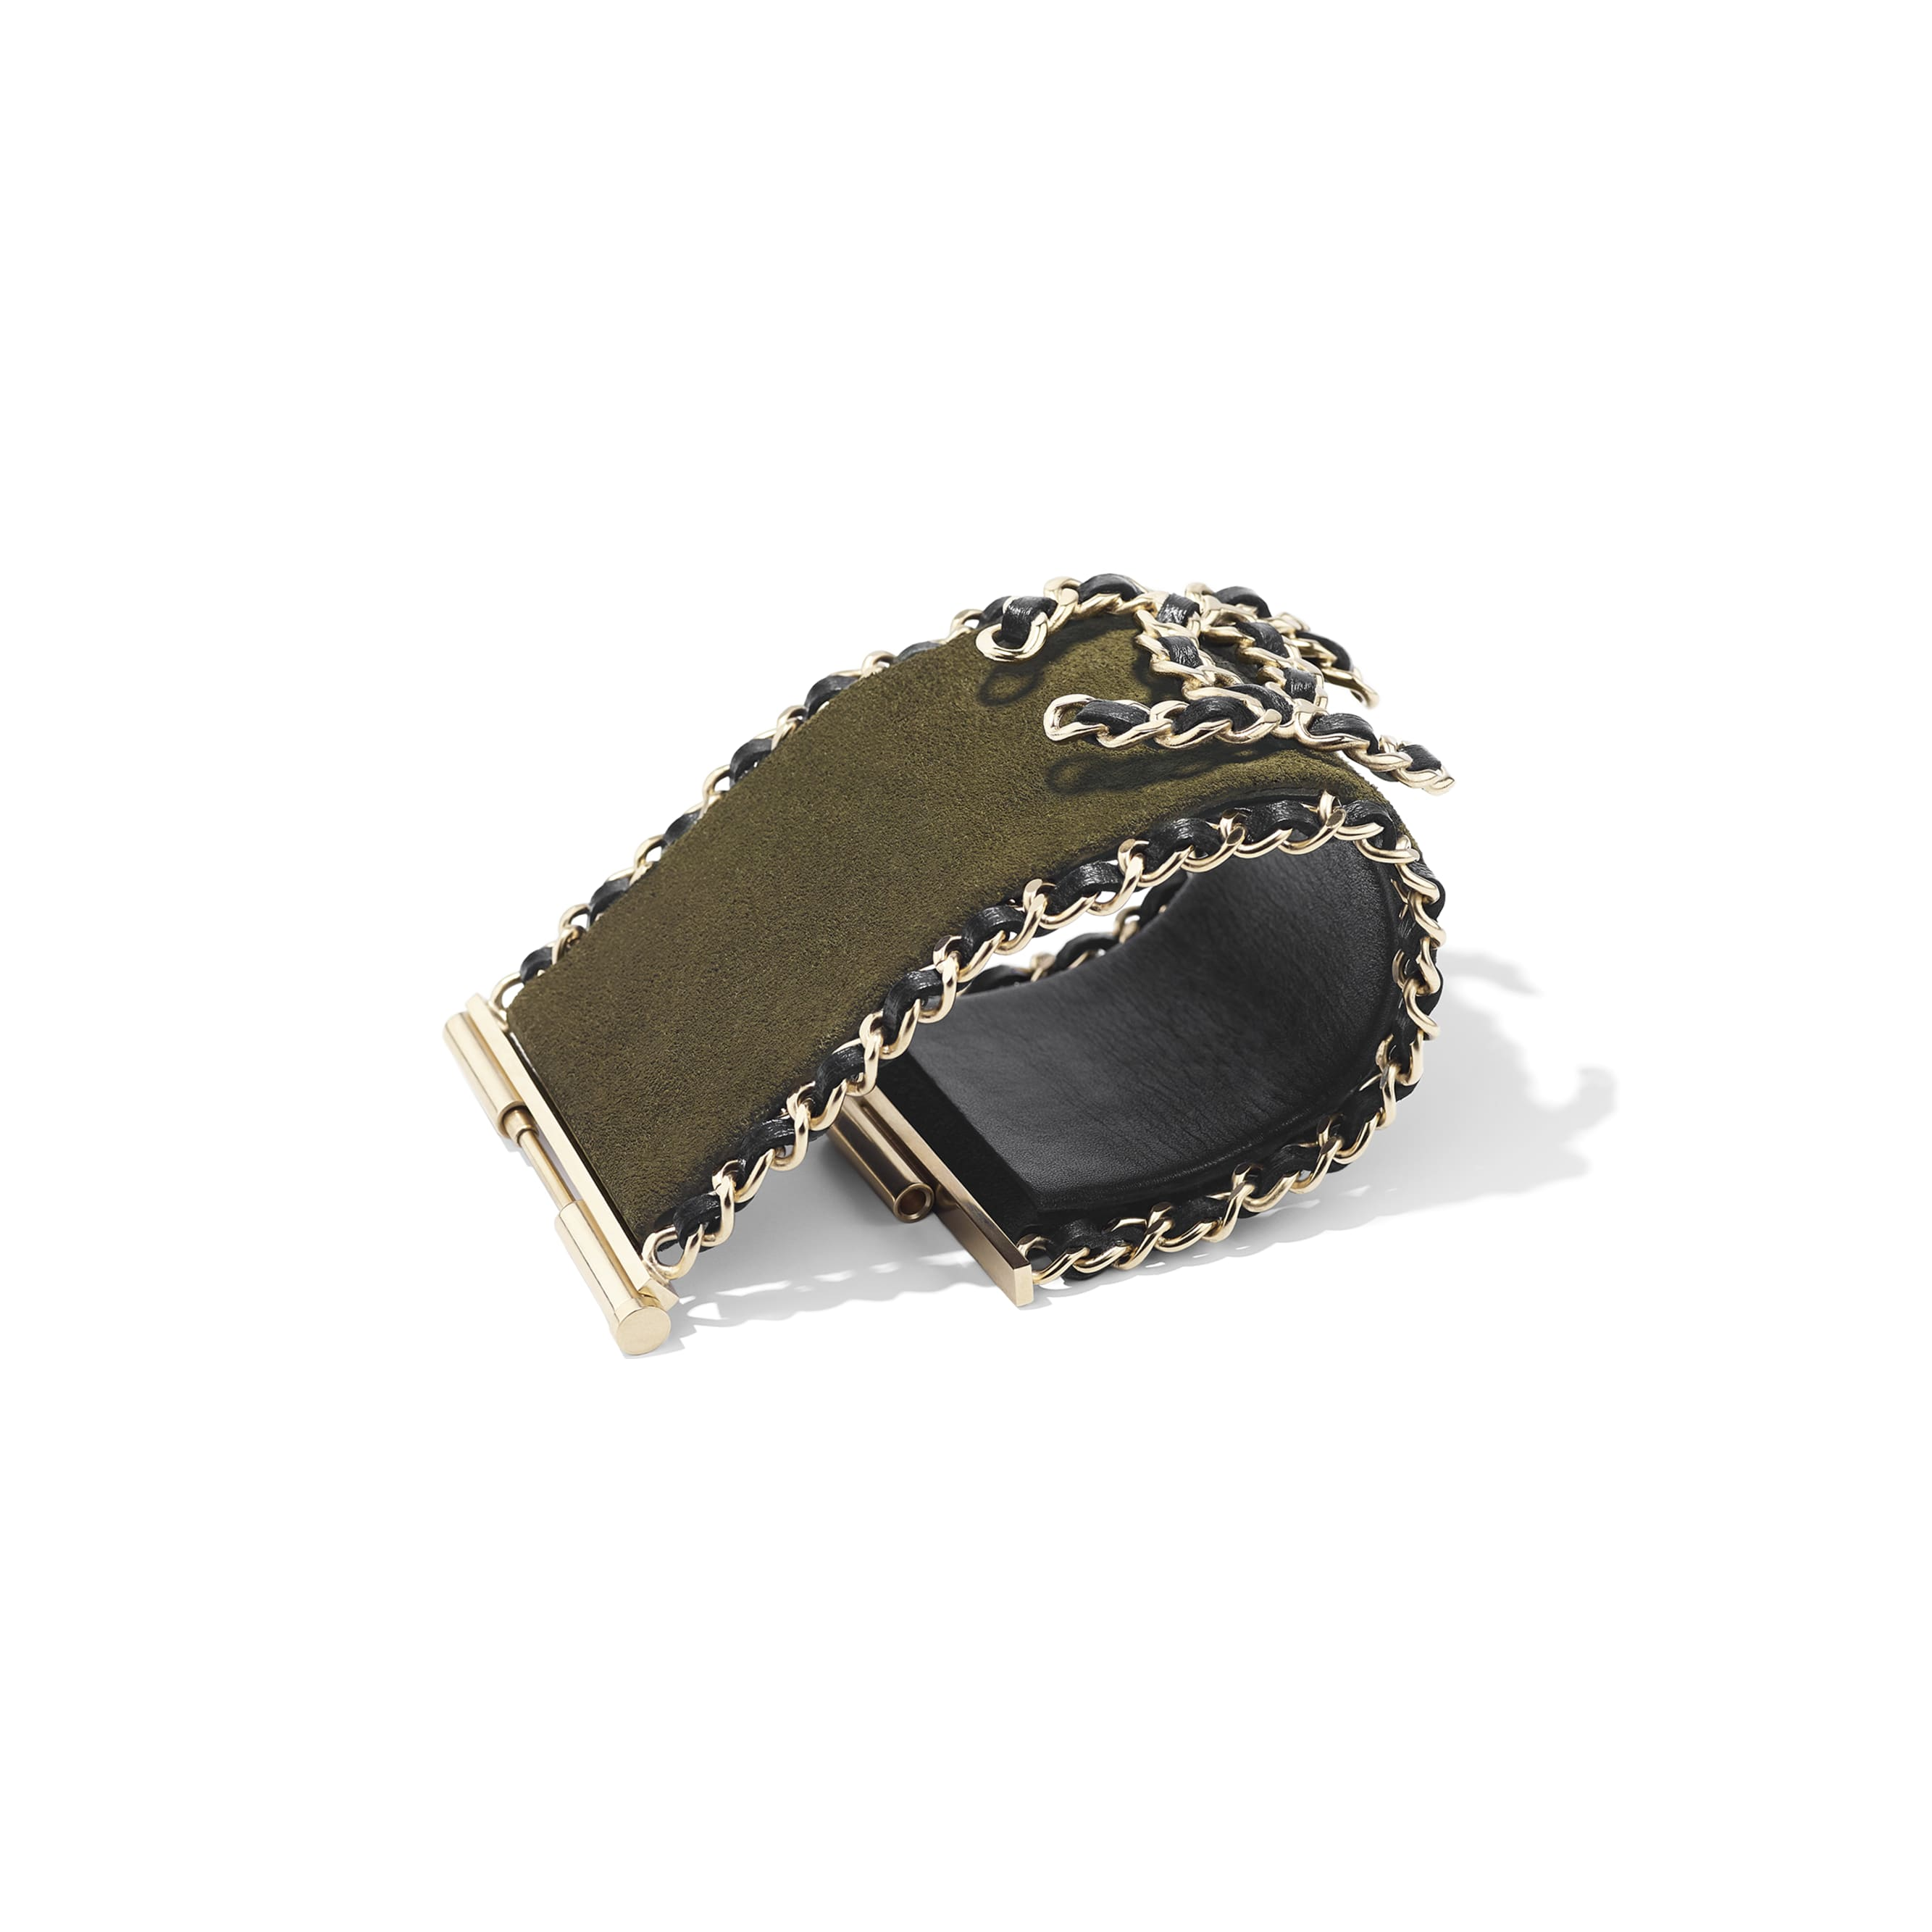 Cuff - Khaki, Black & Gold - Calfskin, Lambskin & Metal - CHANEL - Alternative view - see standard sized version